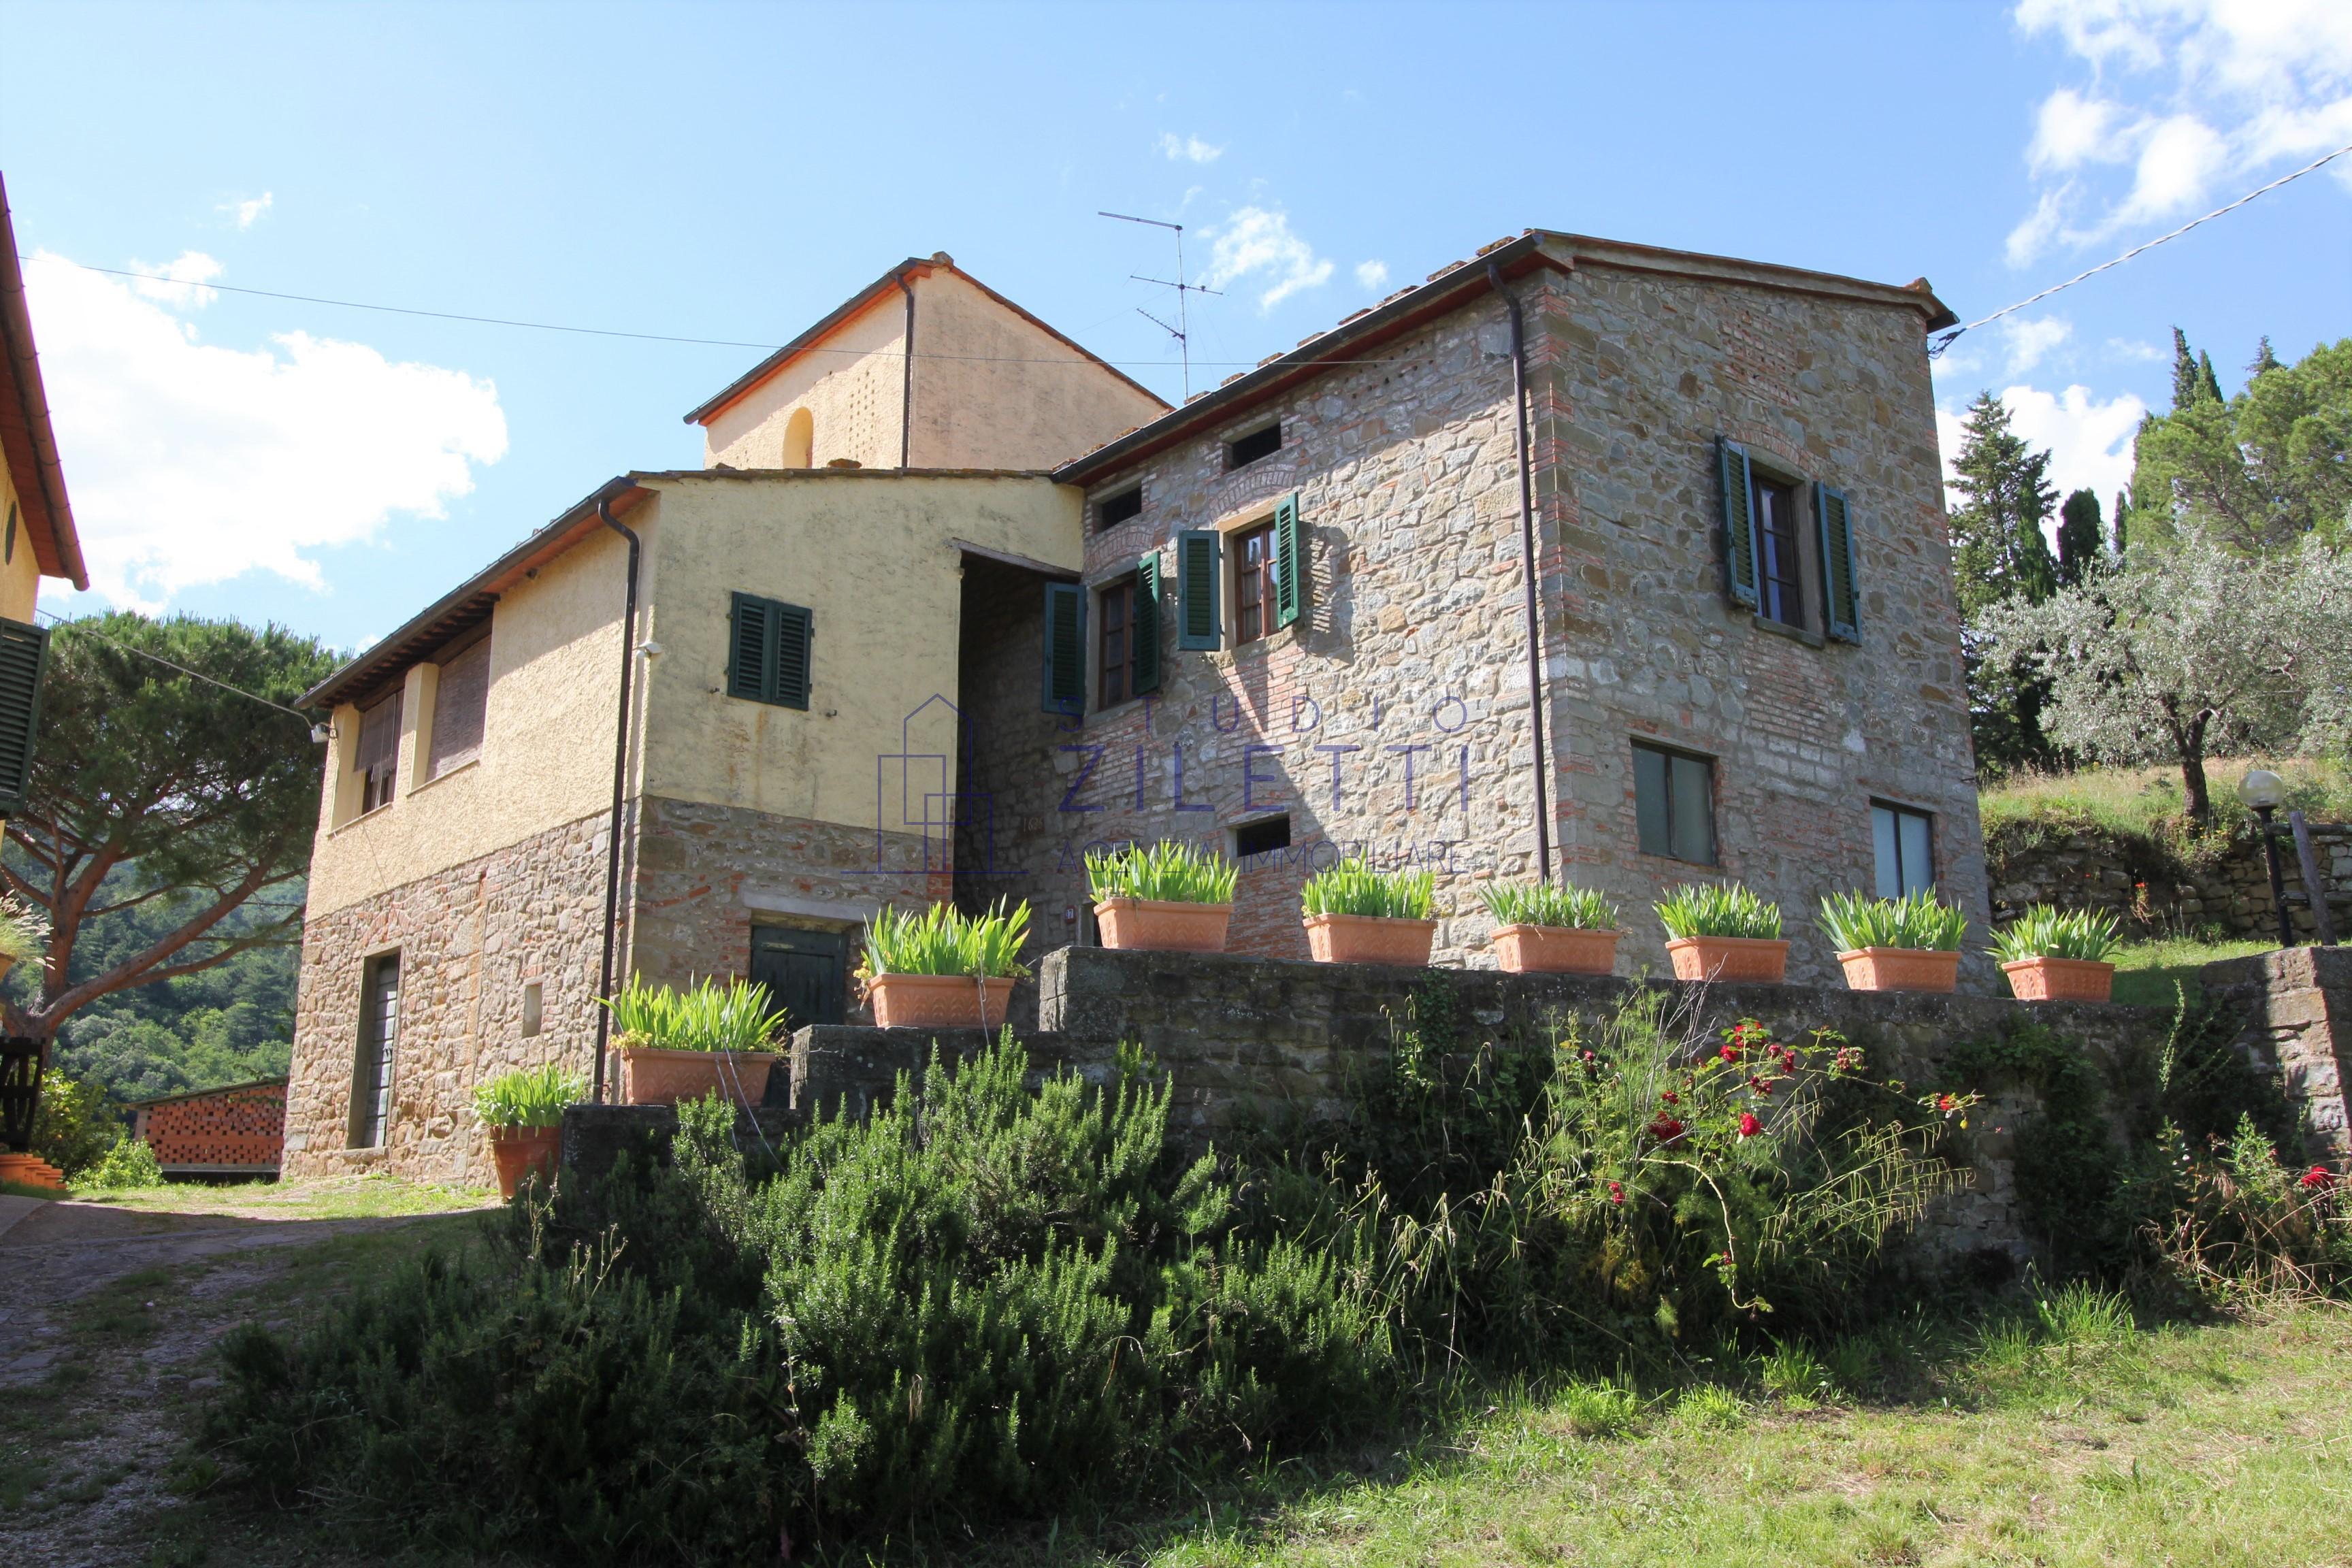 Splendida tenuta tra gli olivi nelle colline Toscane